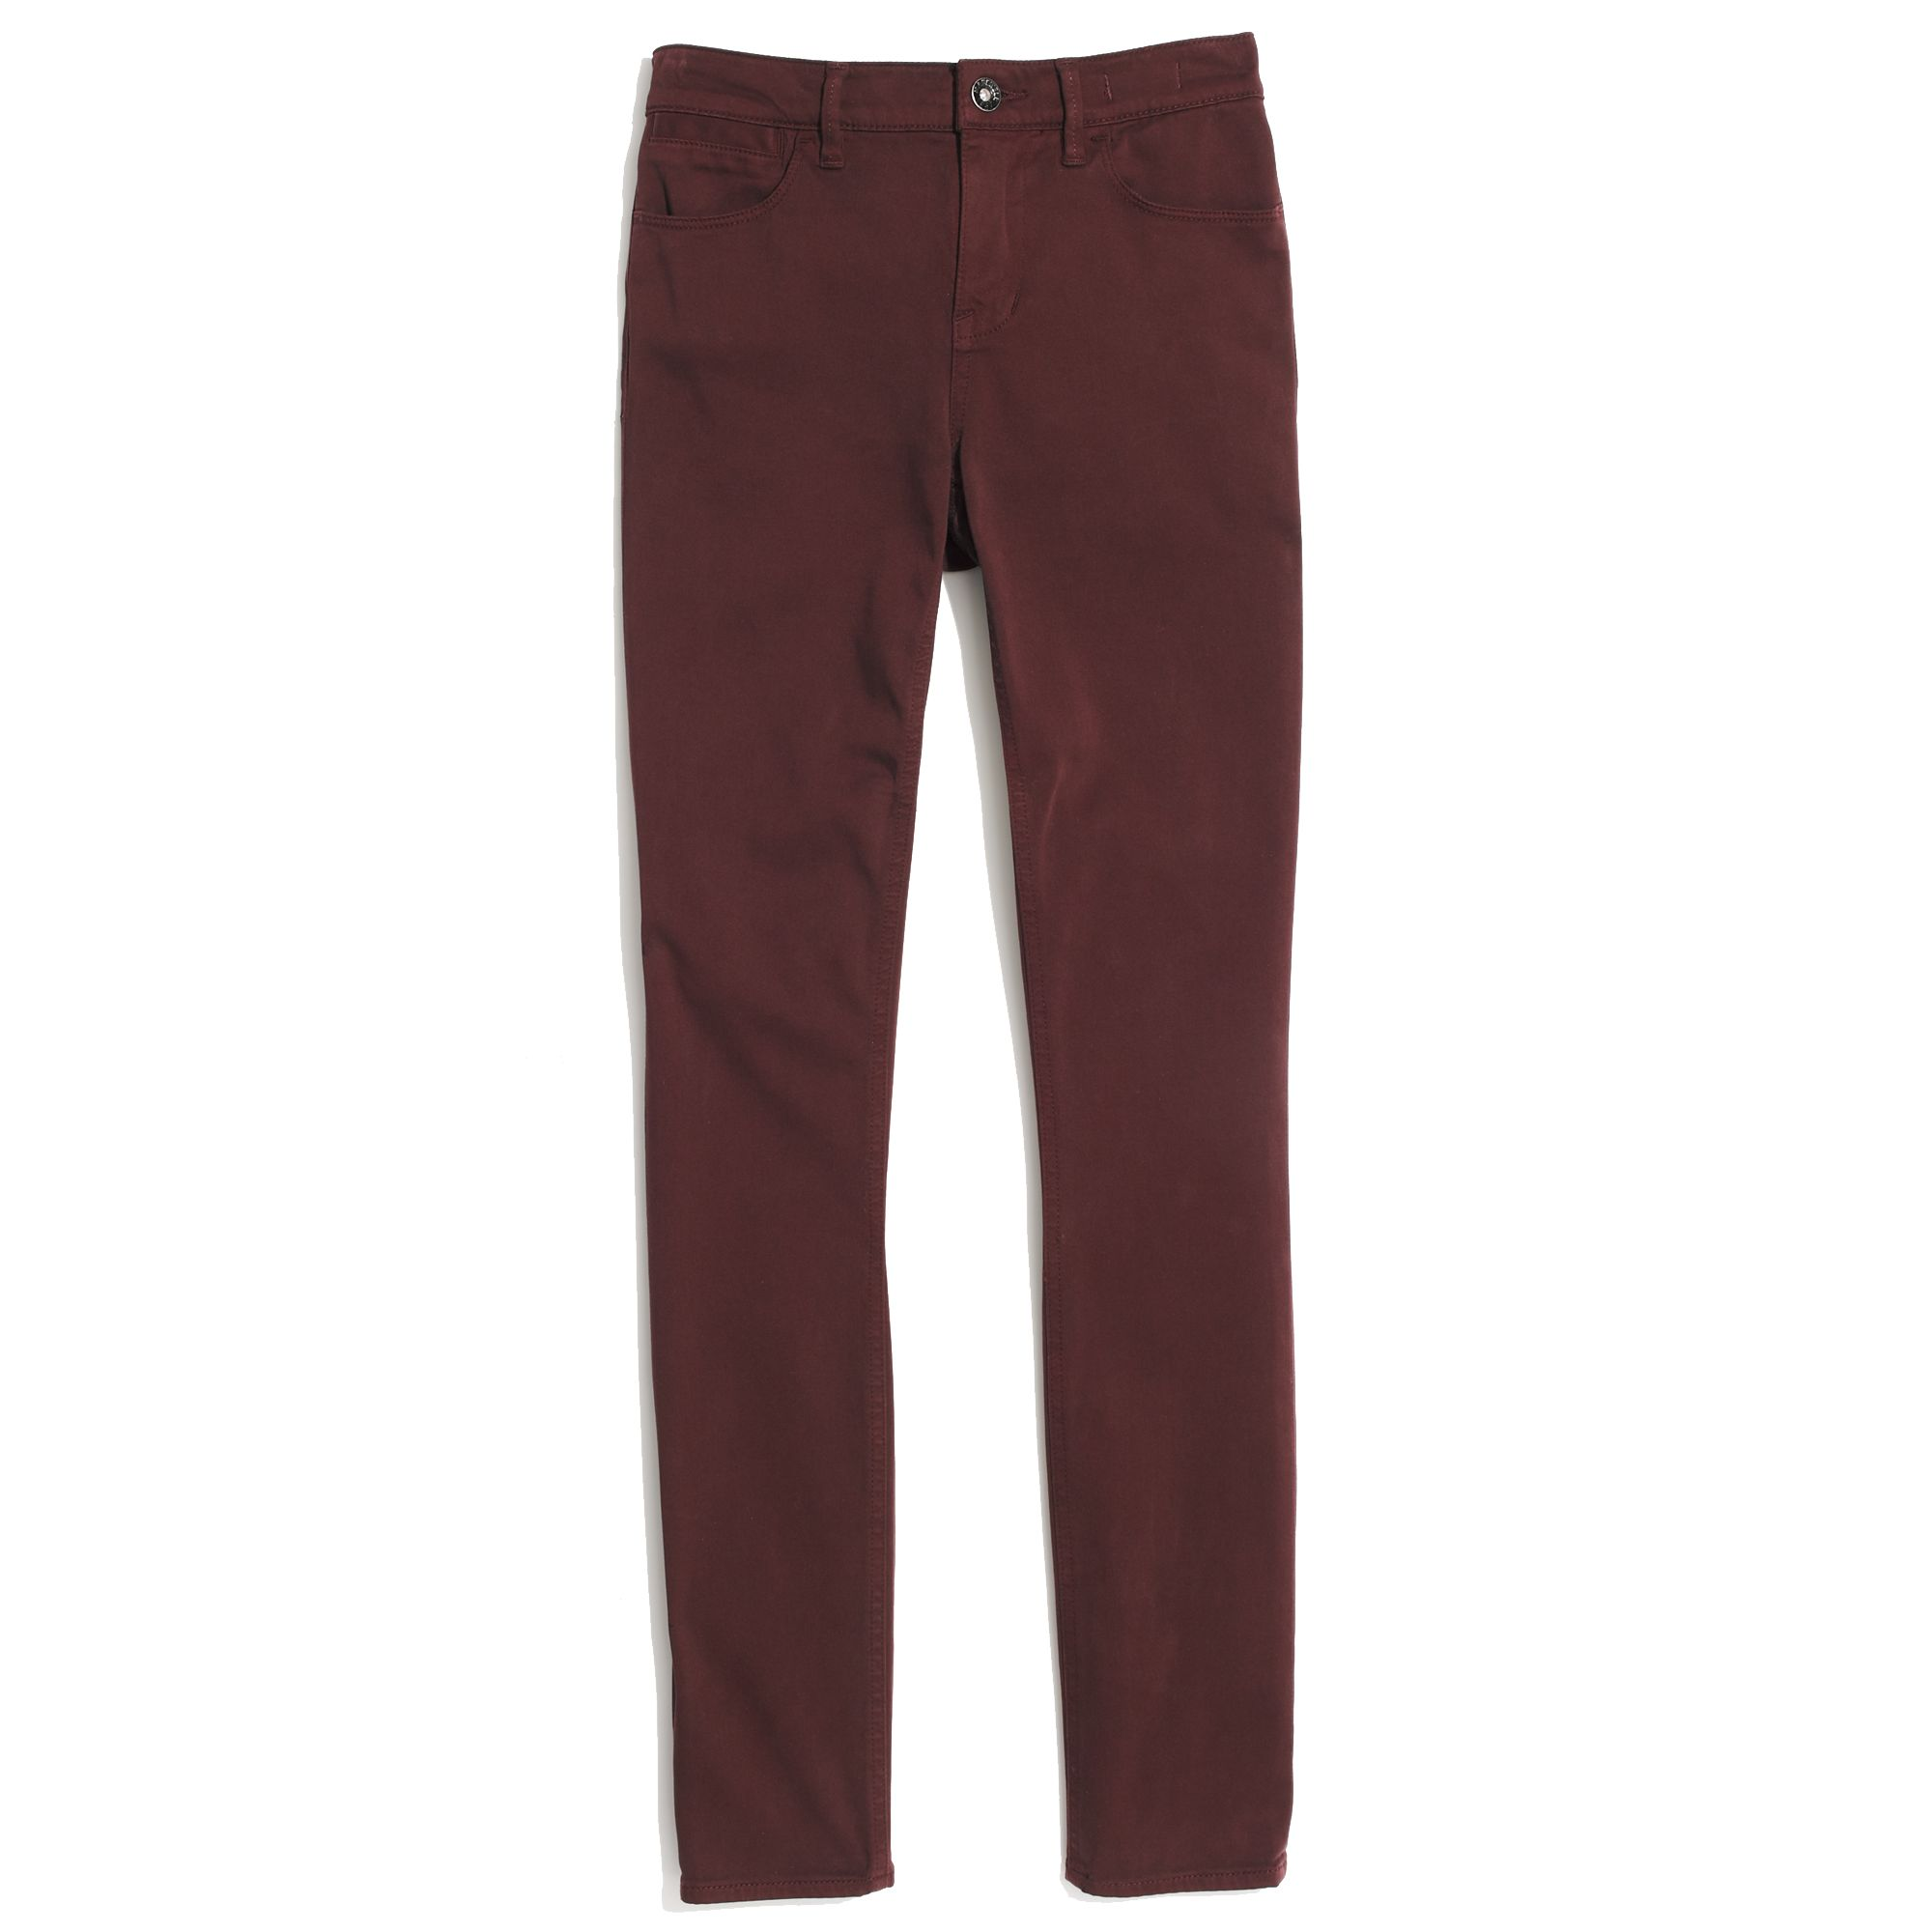 Burgundy Ankle Pants